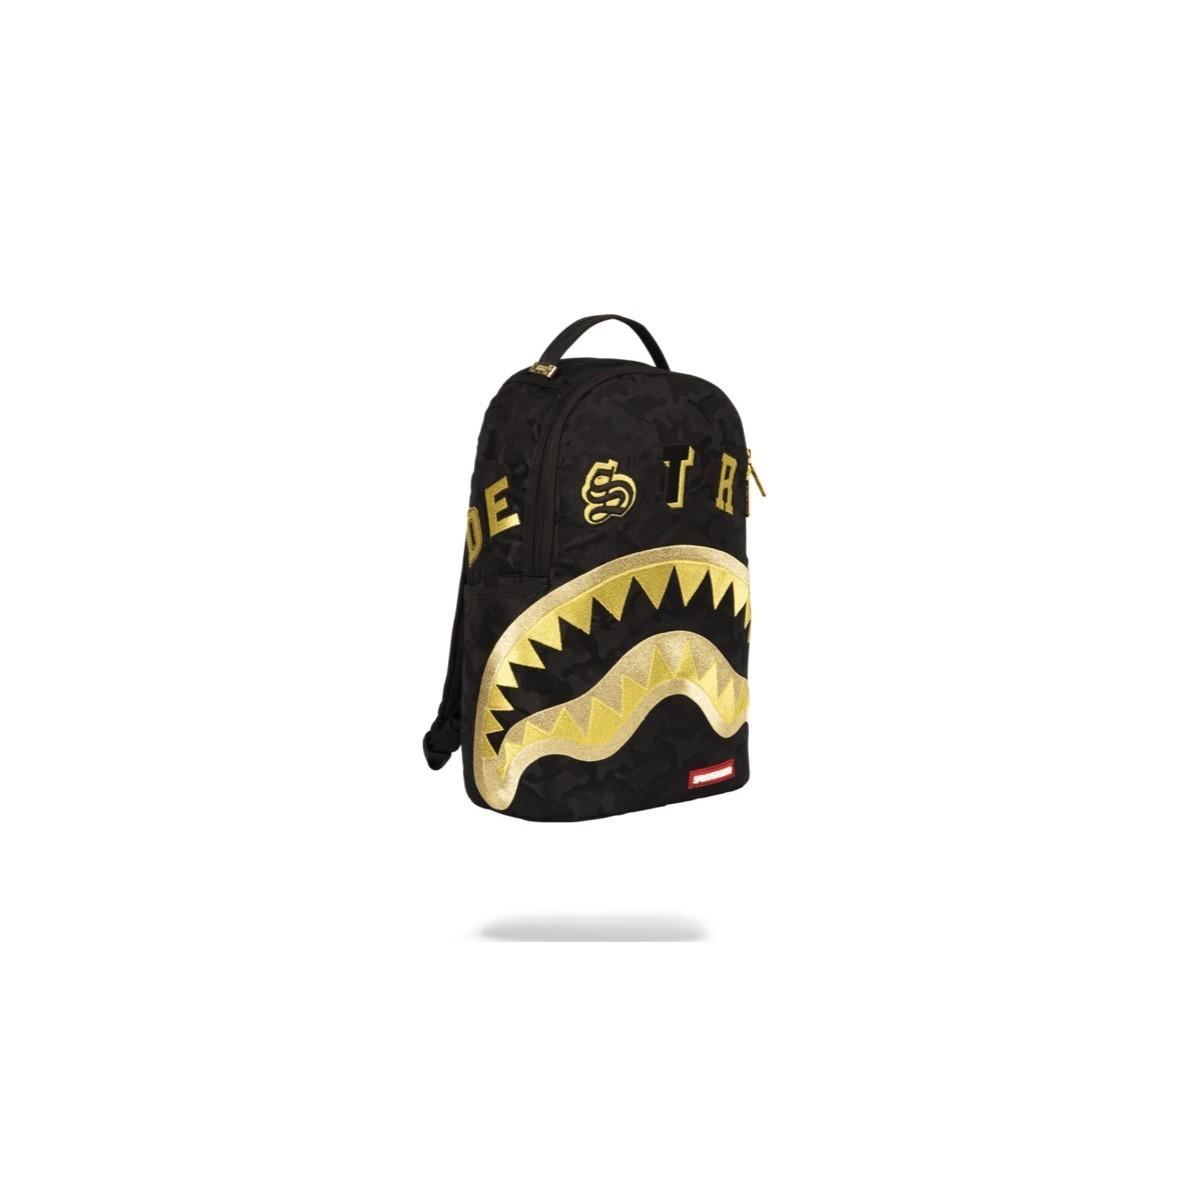 Backpack Sprayground- Destroy black gold camo